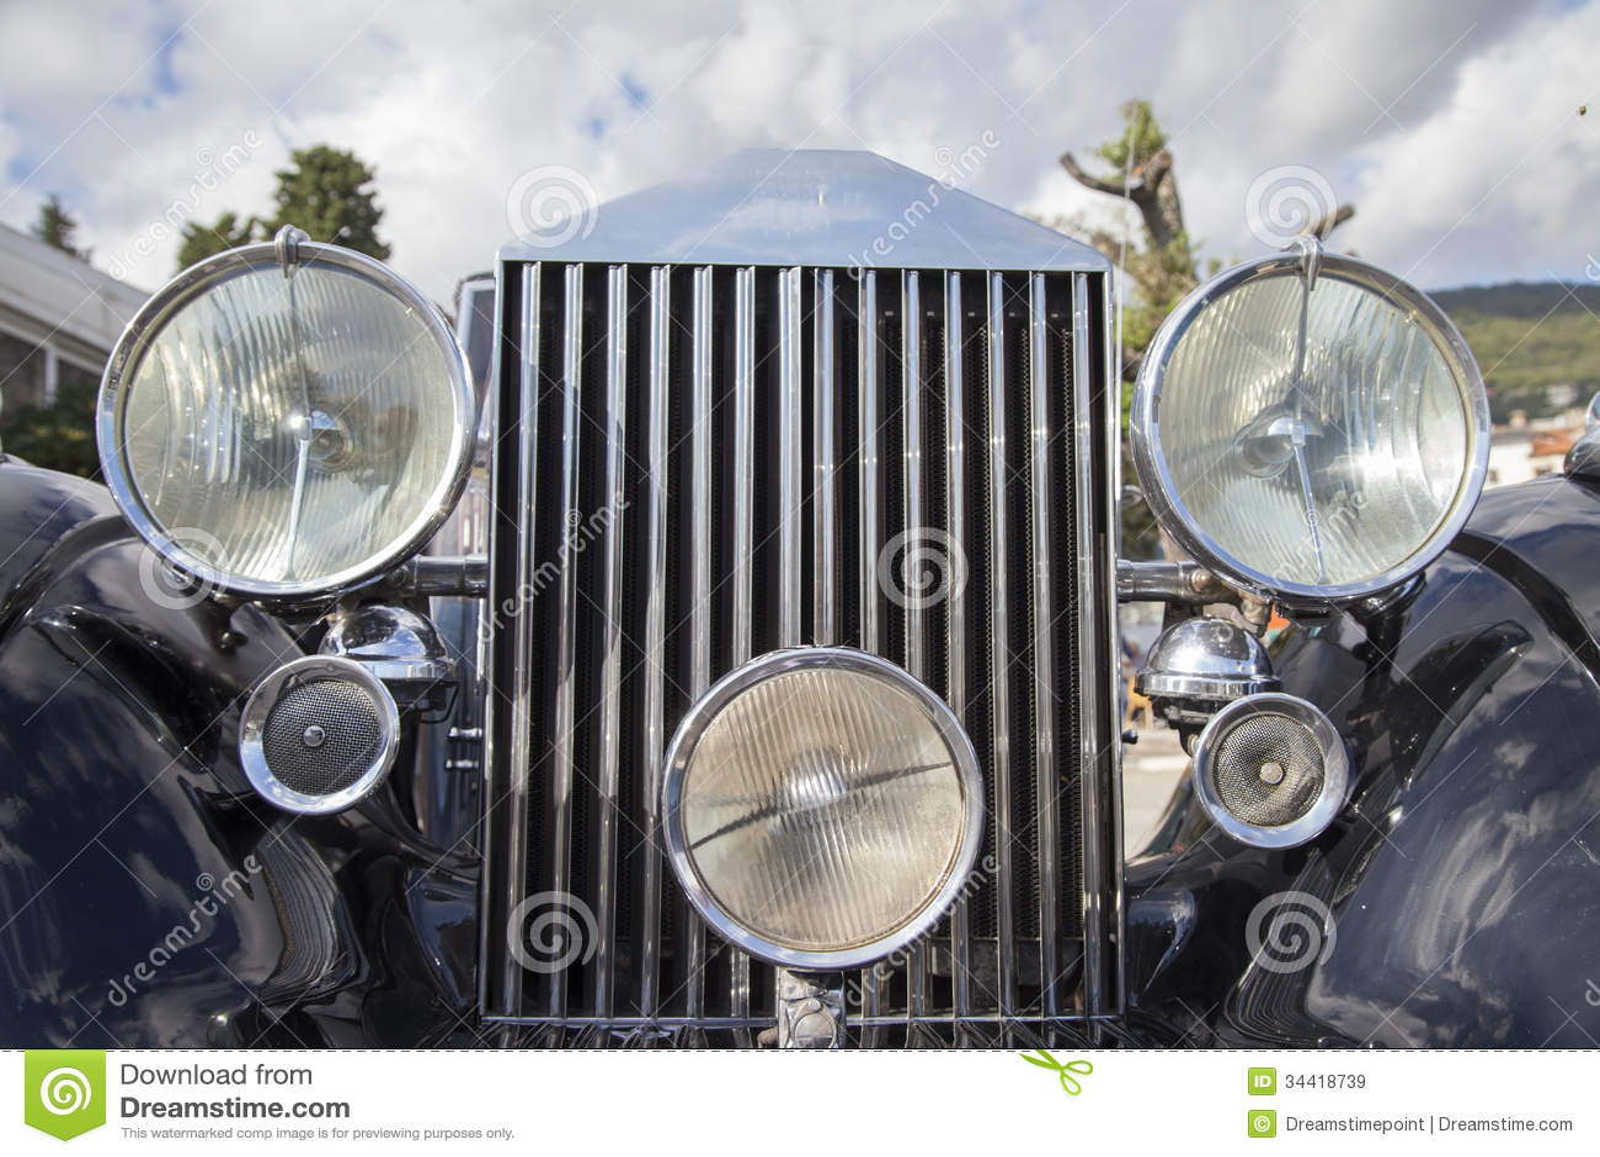 Antique Automobile Headlamps : Vintage car headlights stock image of retro